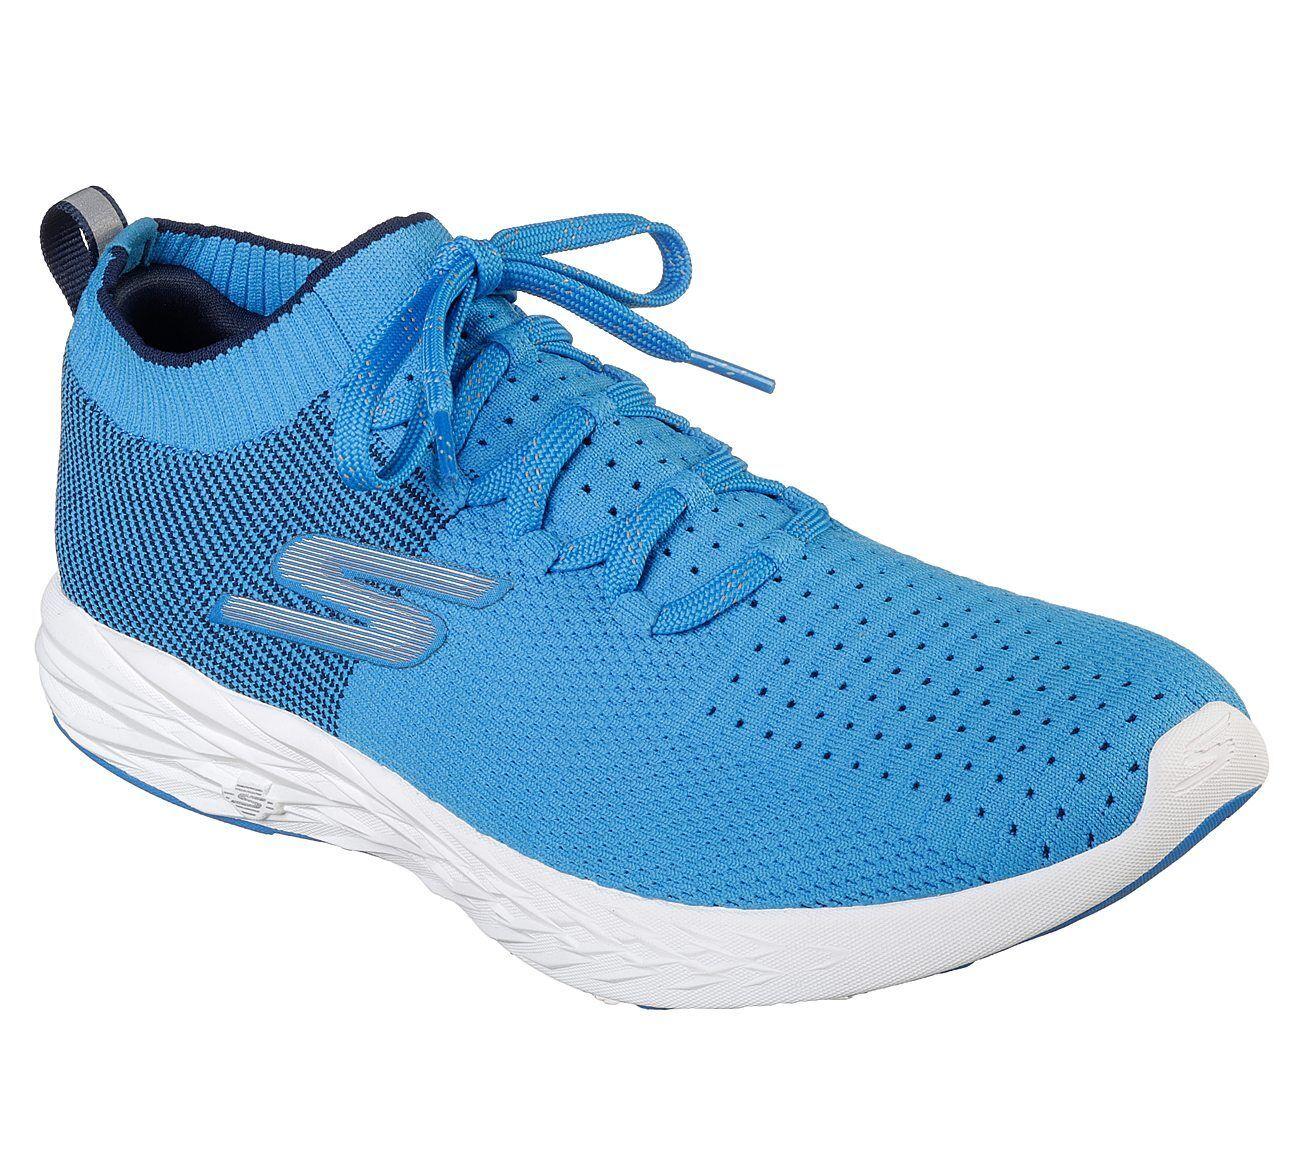 Skechers hommes Performance Go Run 6 bleu 55209/BLU